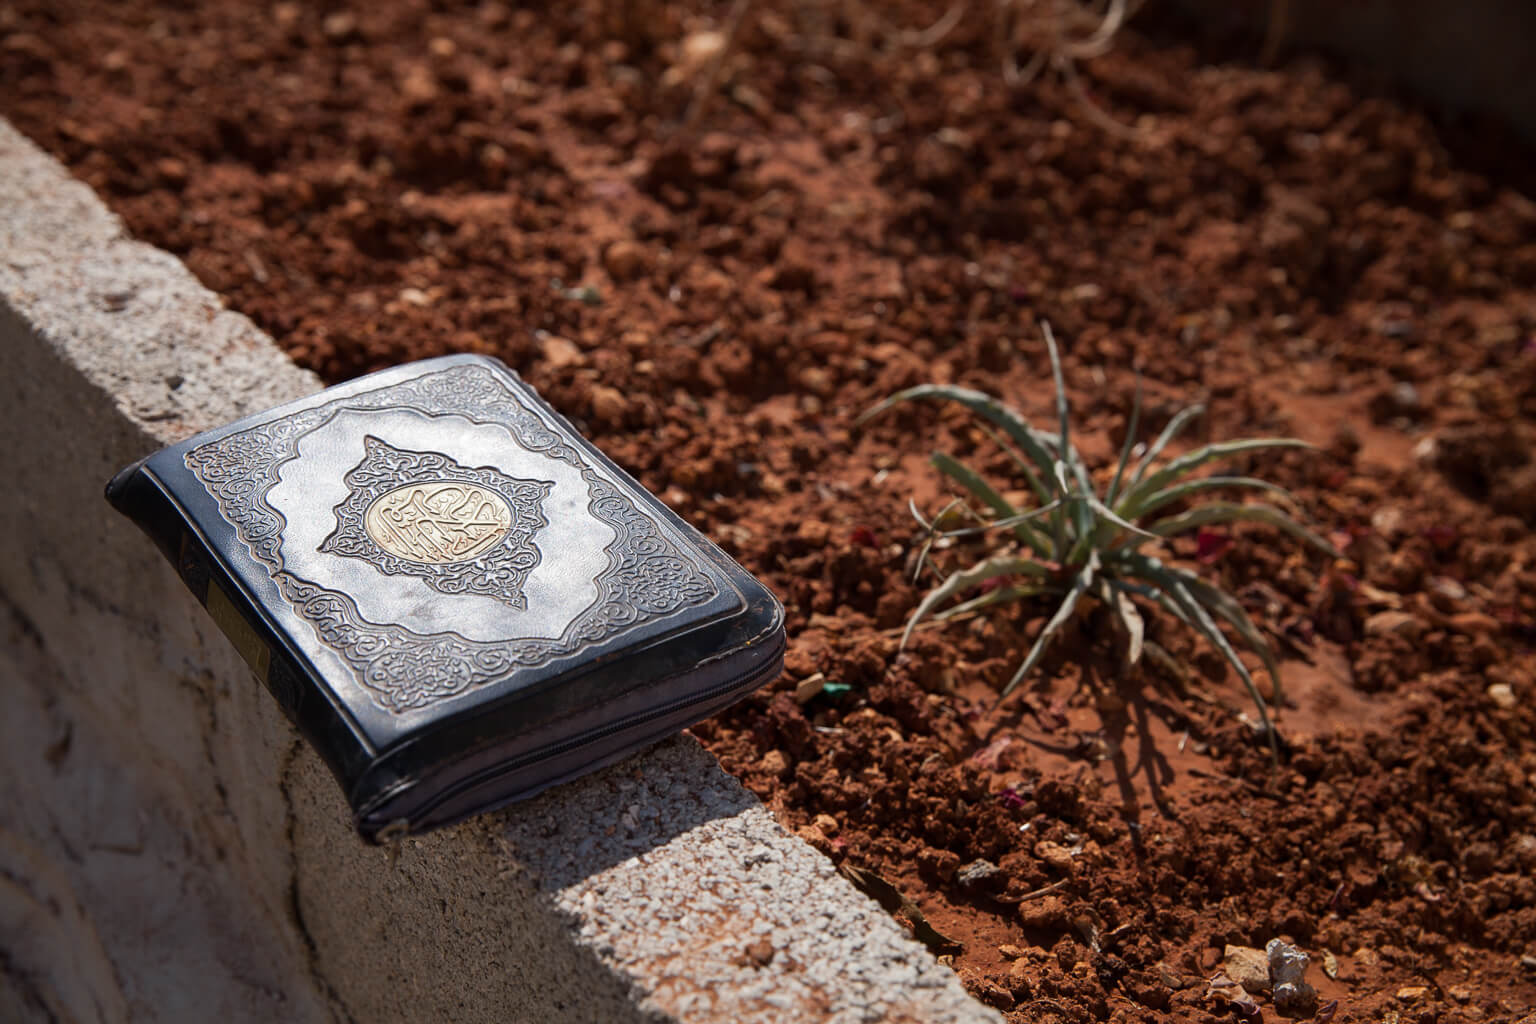 A Koran rests on the grave of Jihad Al-Jafari. (Photo: Rebecca George)